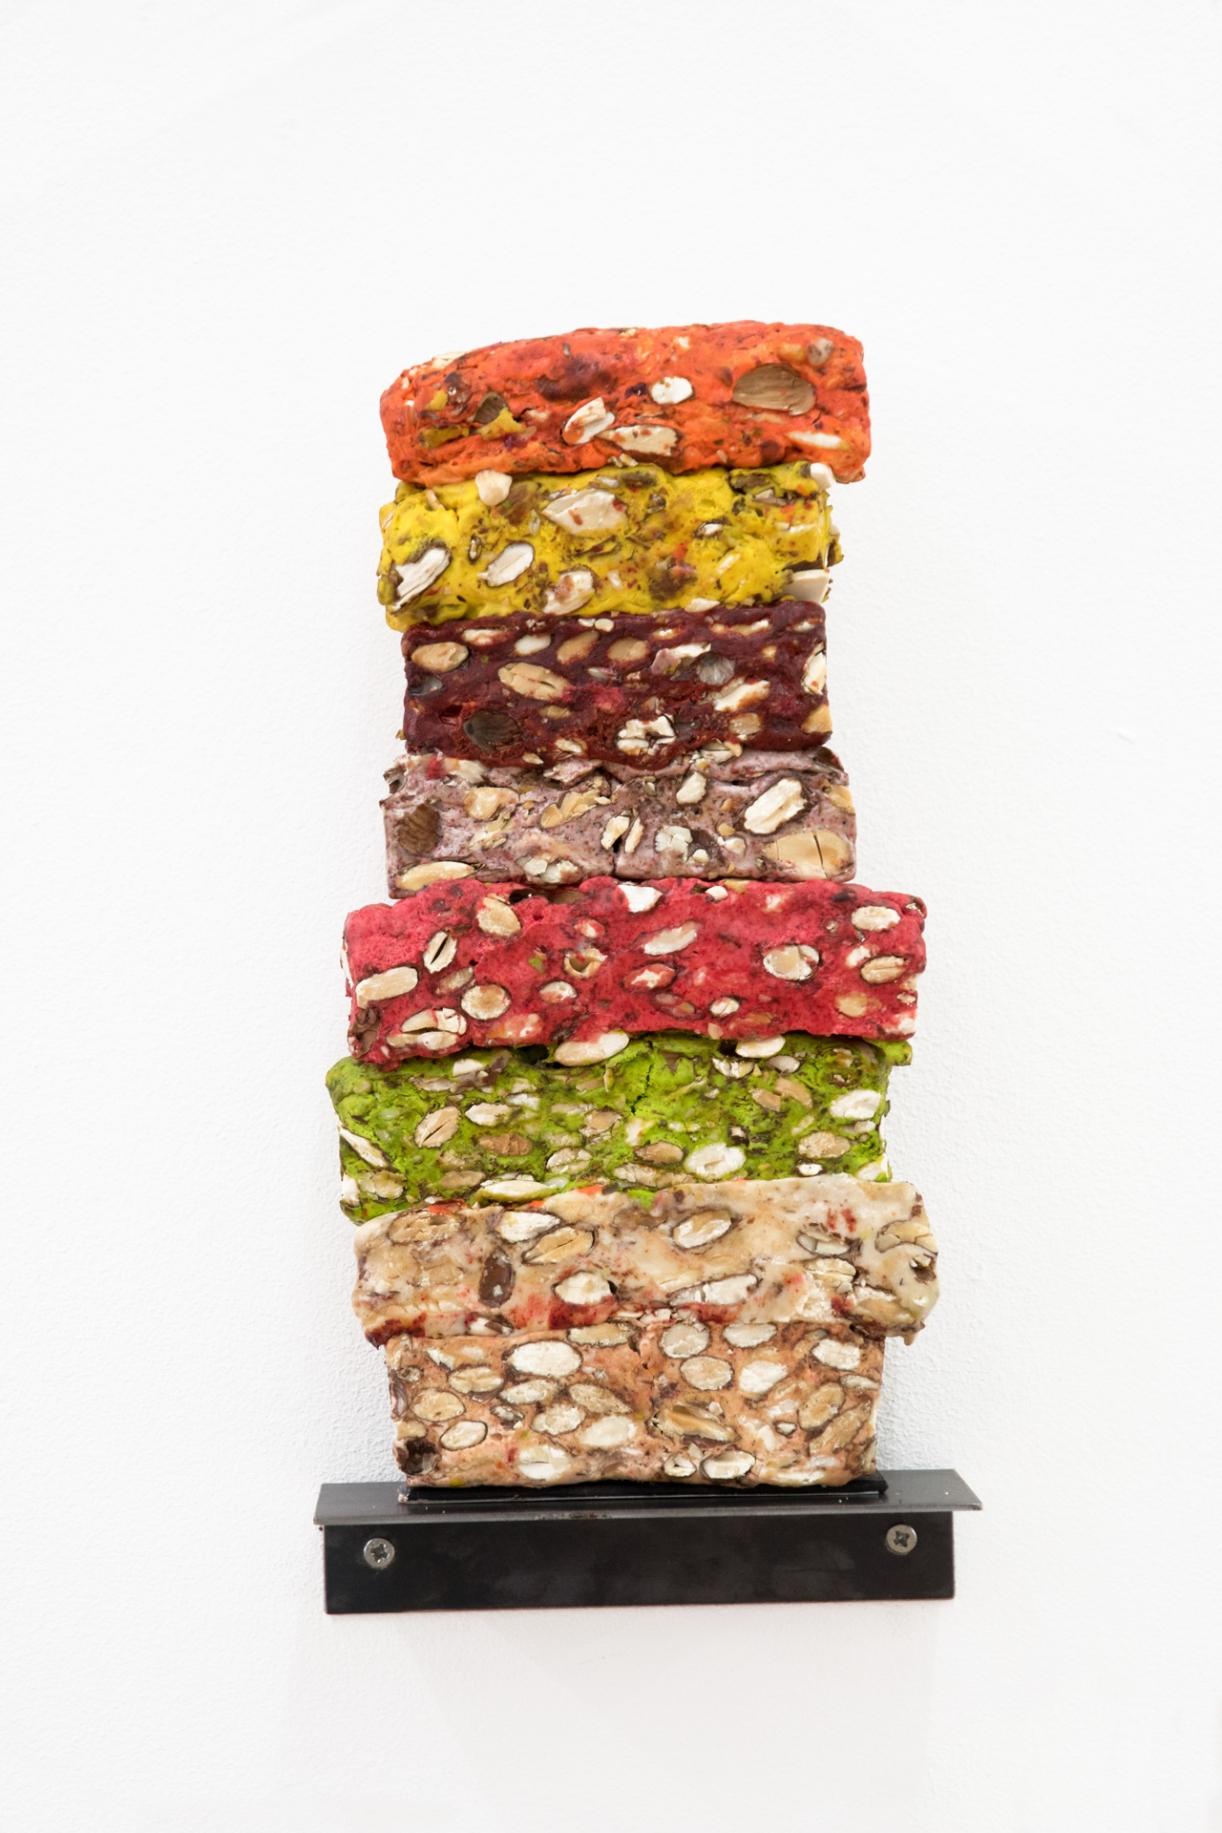 Untitled (Nougat Cross Section Flavor Sampler, fig.3), 2016, Moroccan sweets, vanished, 28.9 x 15 x 4.4 cm